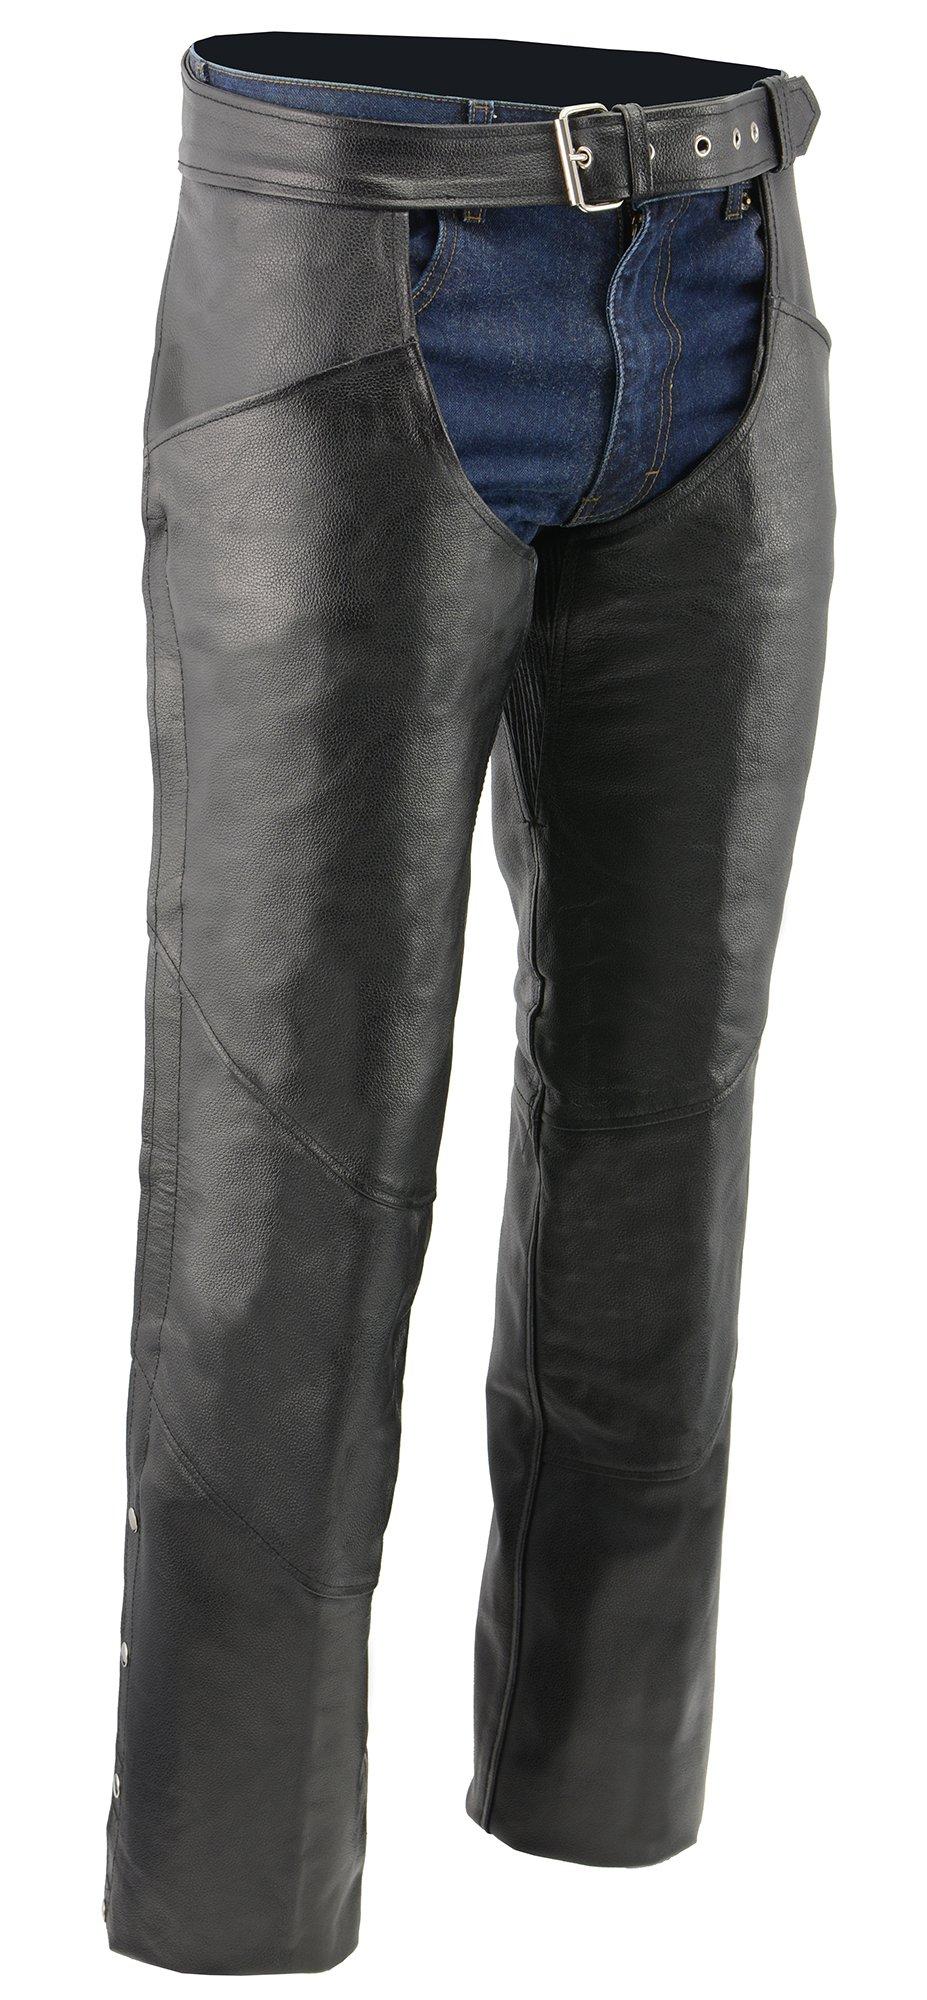 M-BOSS MOTORCYCLE APPAREL-BOS15507T-BLACK-Men's tall biker leather chaps.-BLACK-2XL-TALL